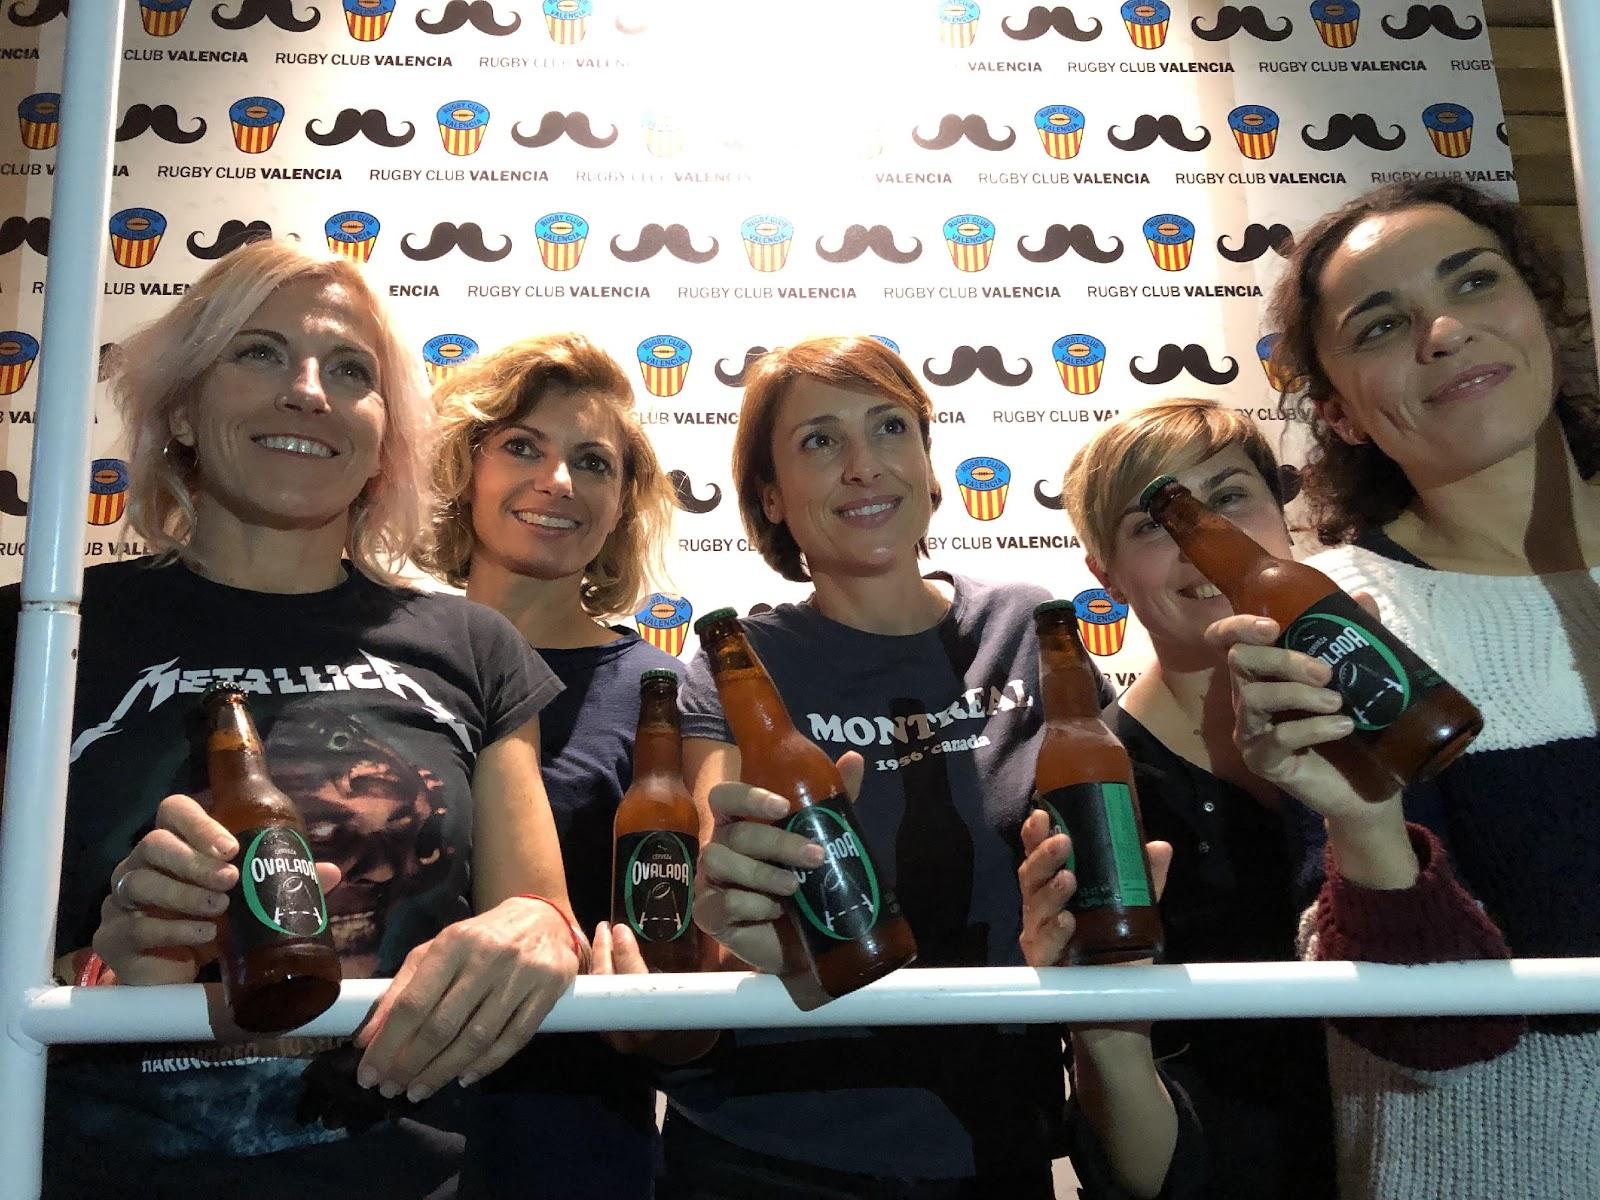 Macintosh HD:Users:jbbenet:Dropbox:Public:Cerveza OVALADA:Fotos Ovalada:Ovalada Movember chicas.jpg